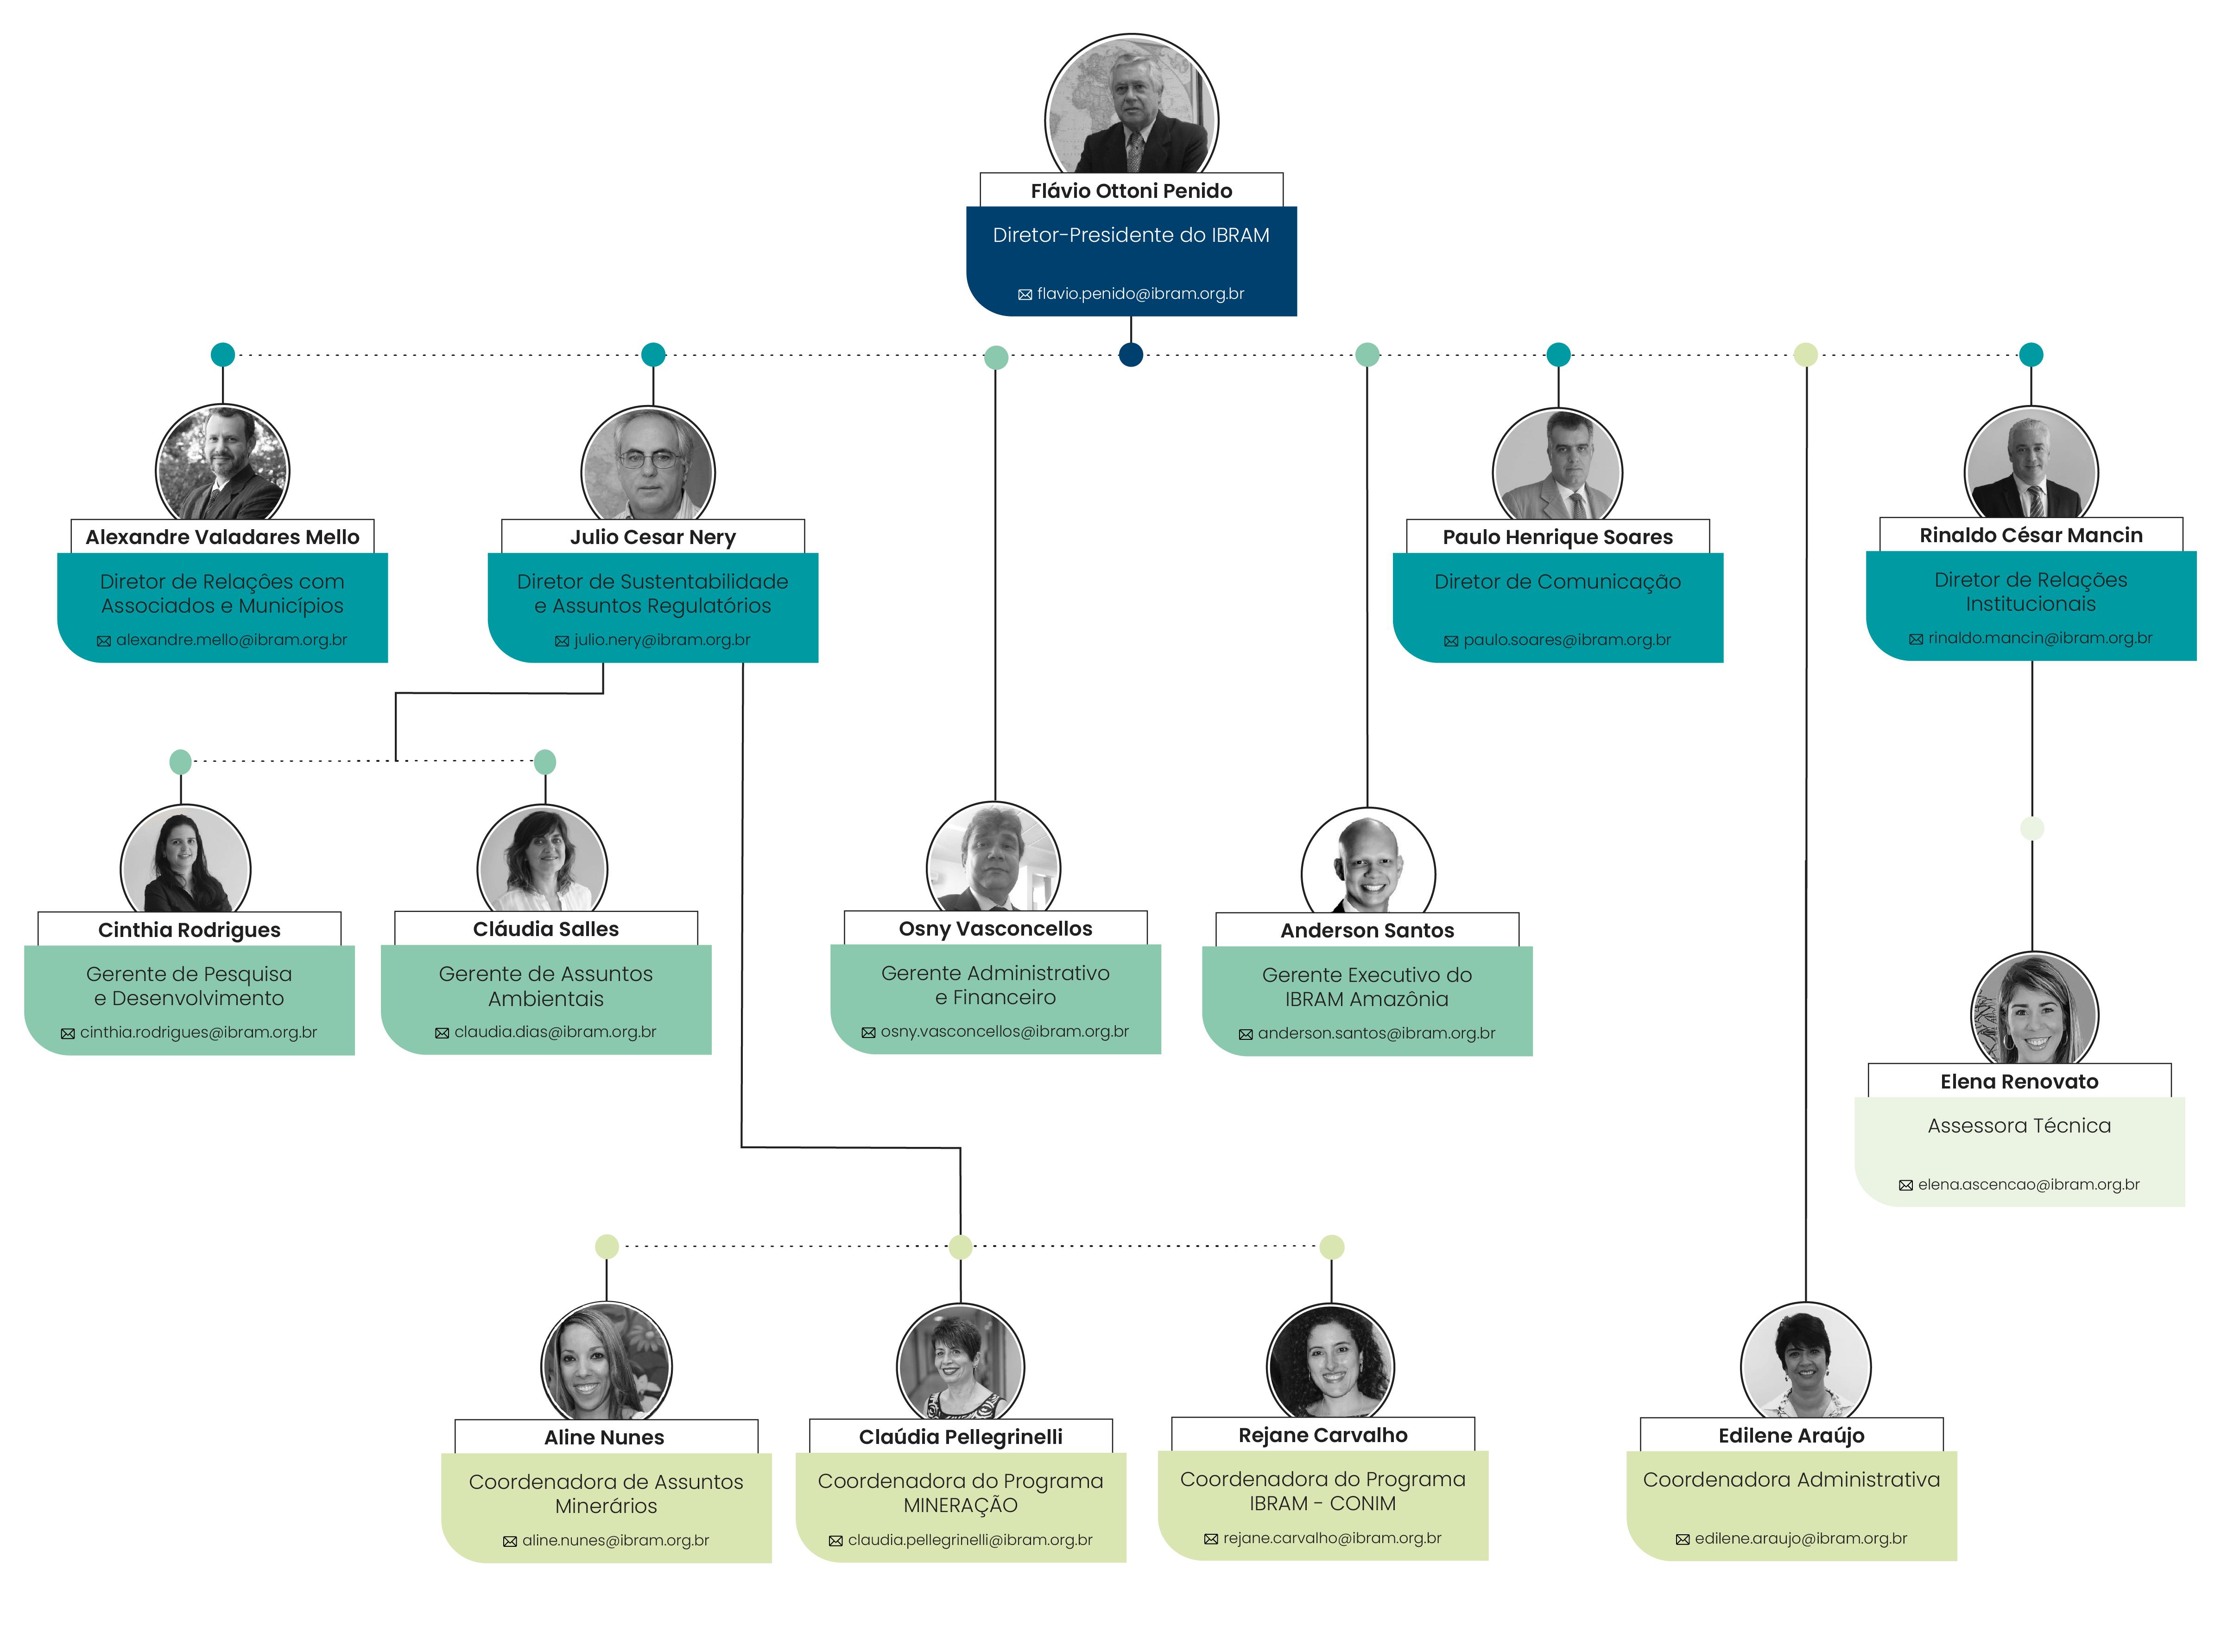 Organograma institucional do Ibram